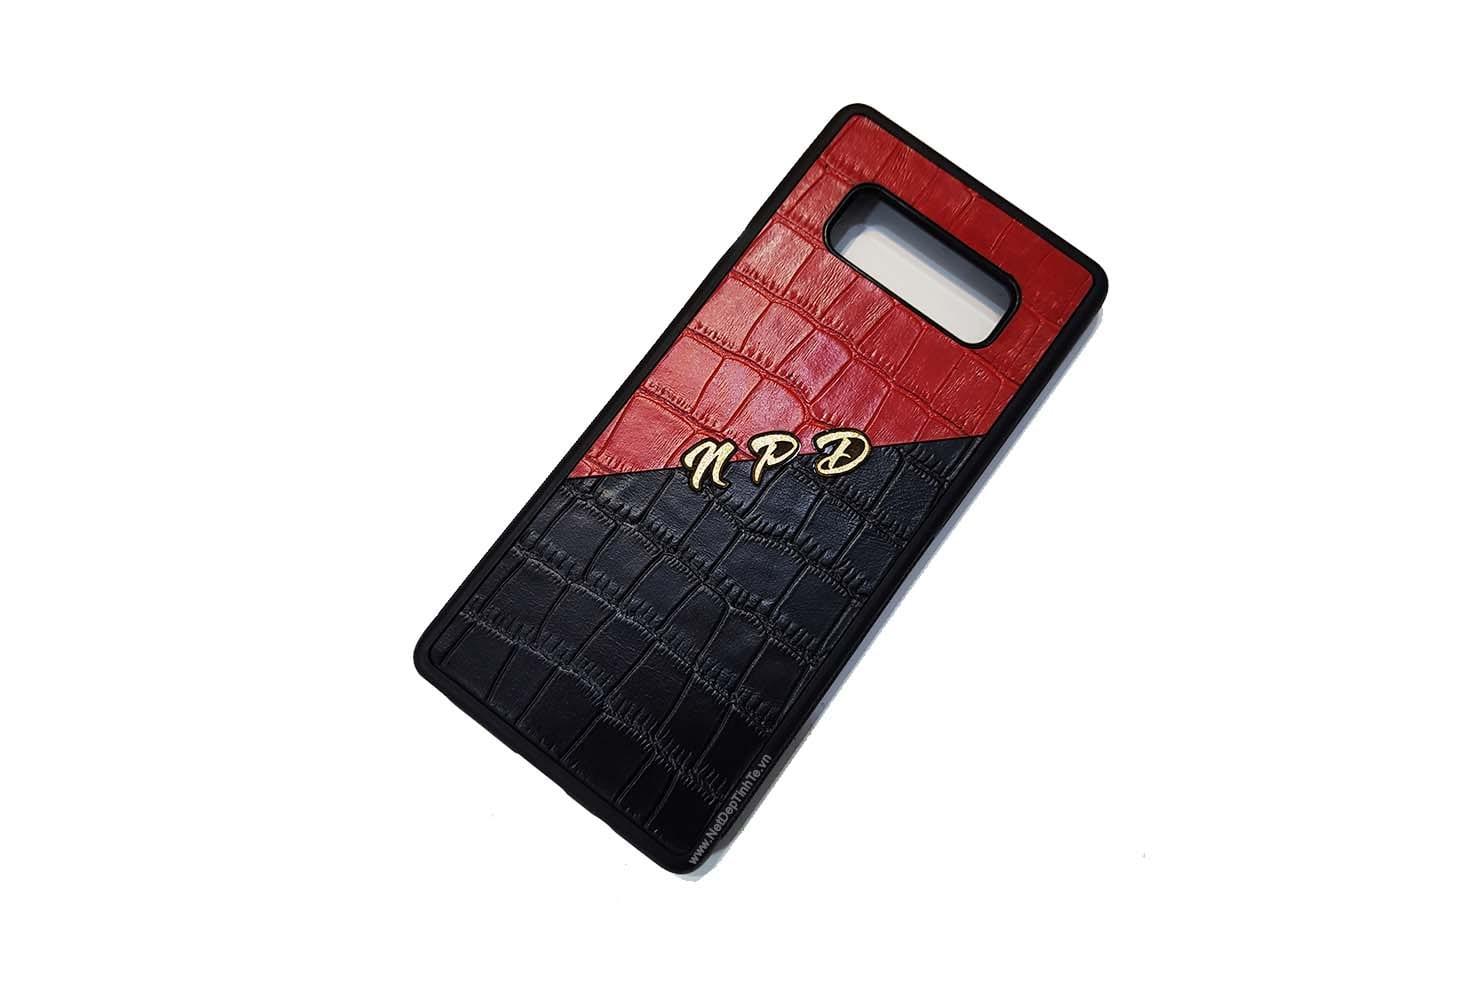 Ốp da điện thoại Samsung Note 8